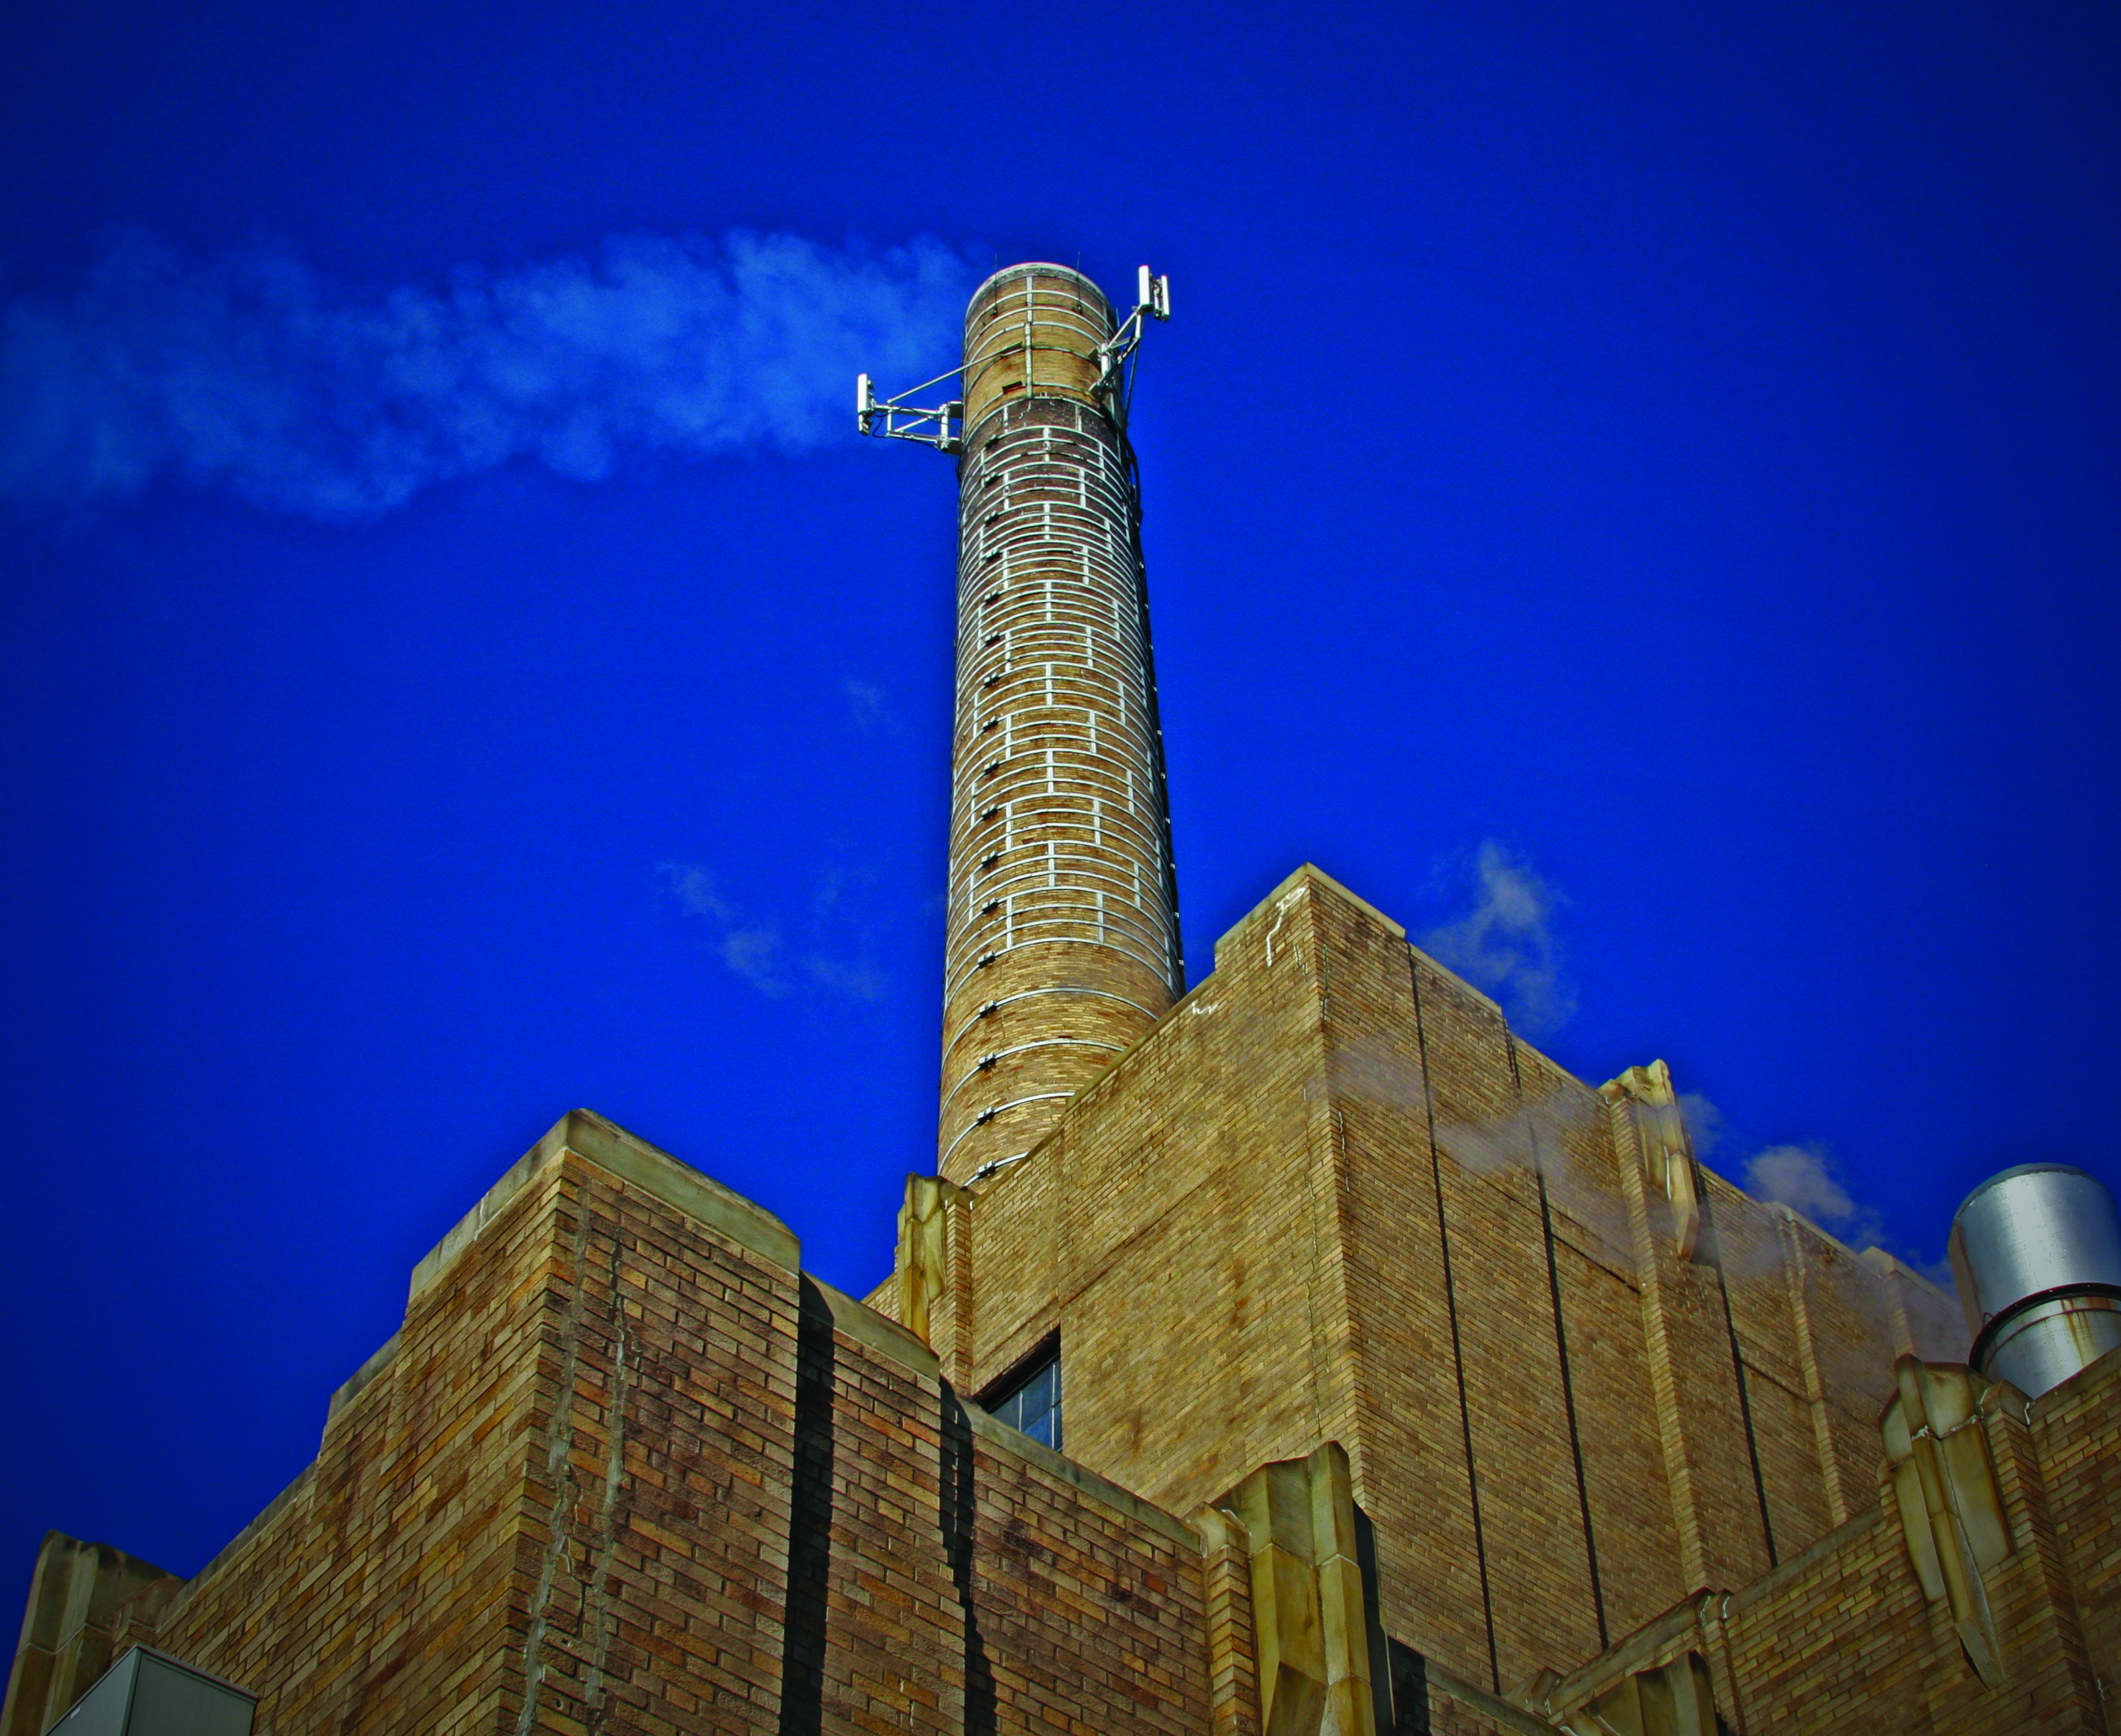 College coal plant fuels sustainability debate on campus